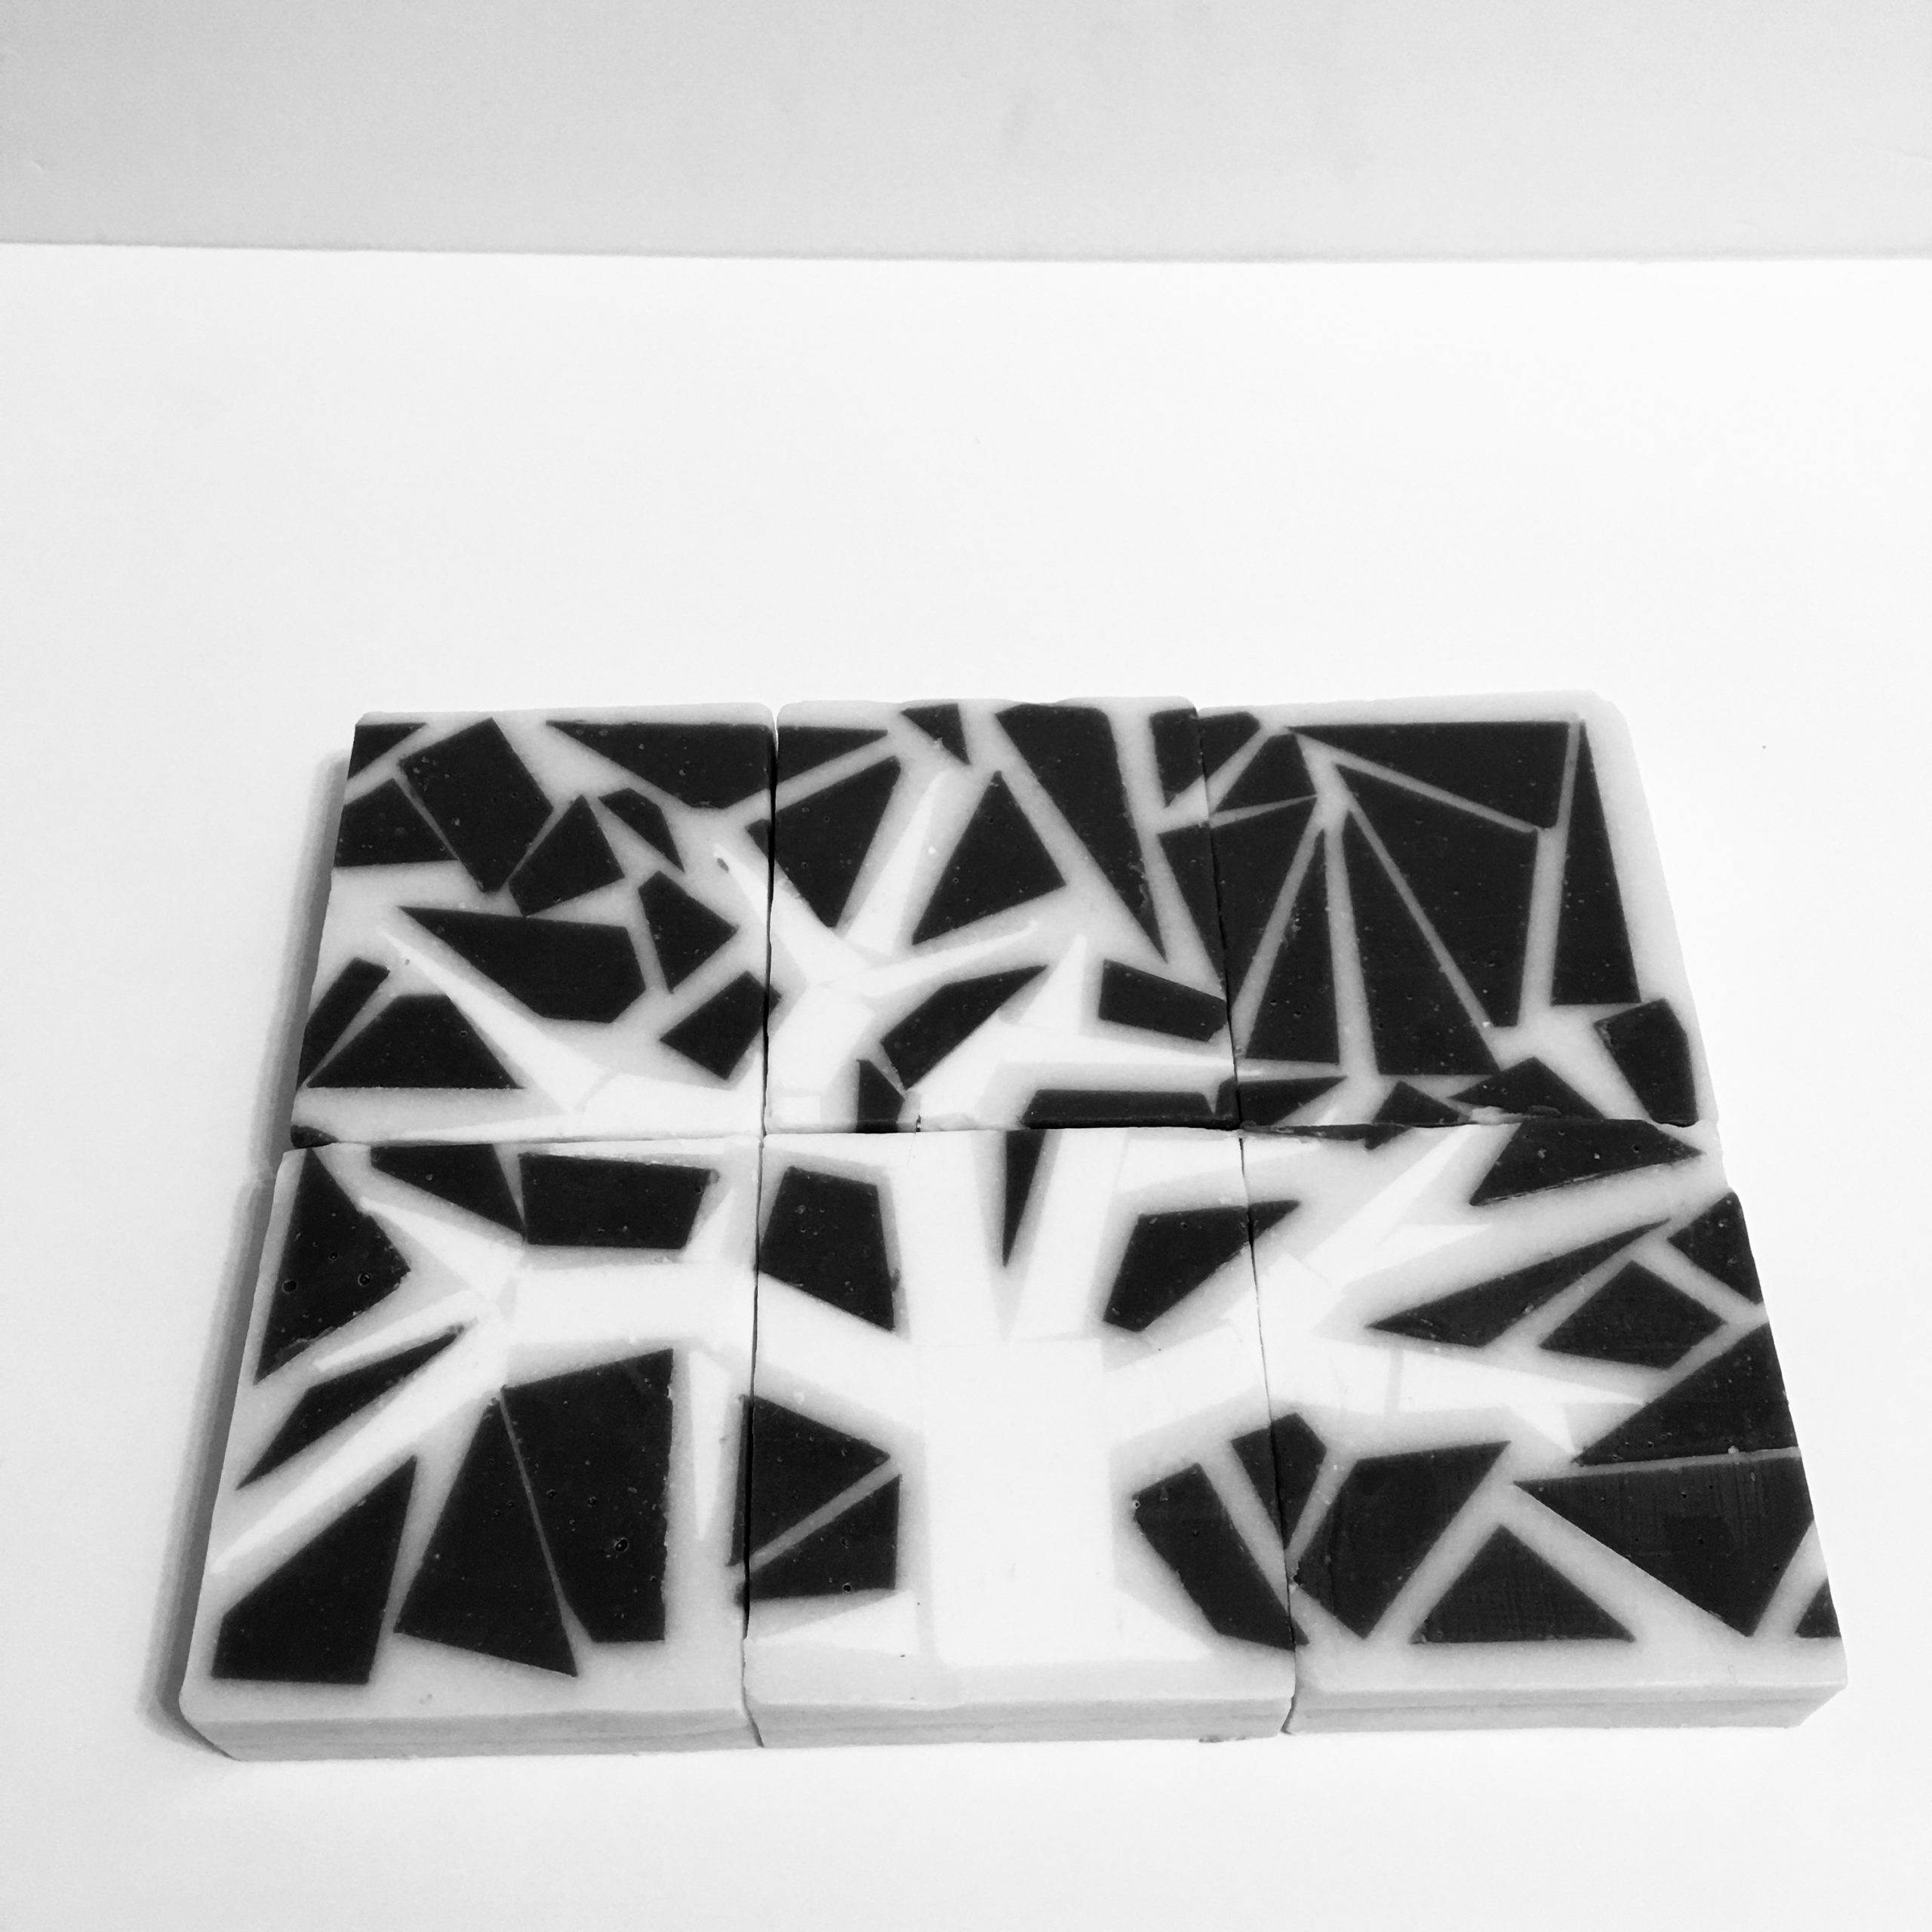 silhouette mosaic soap